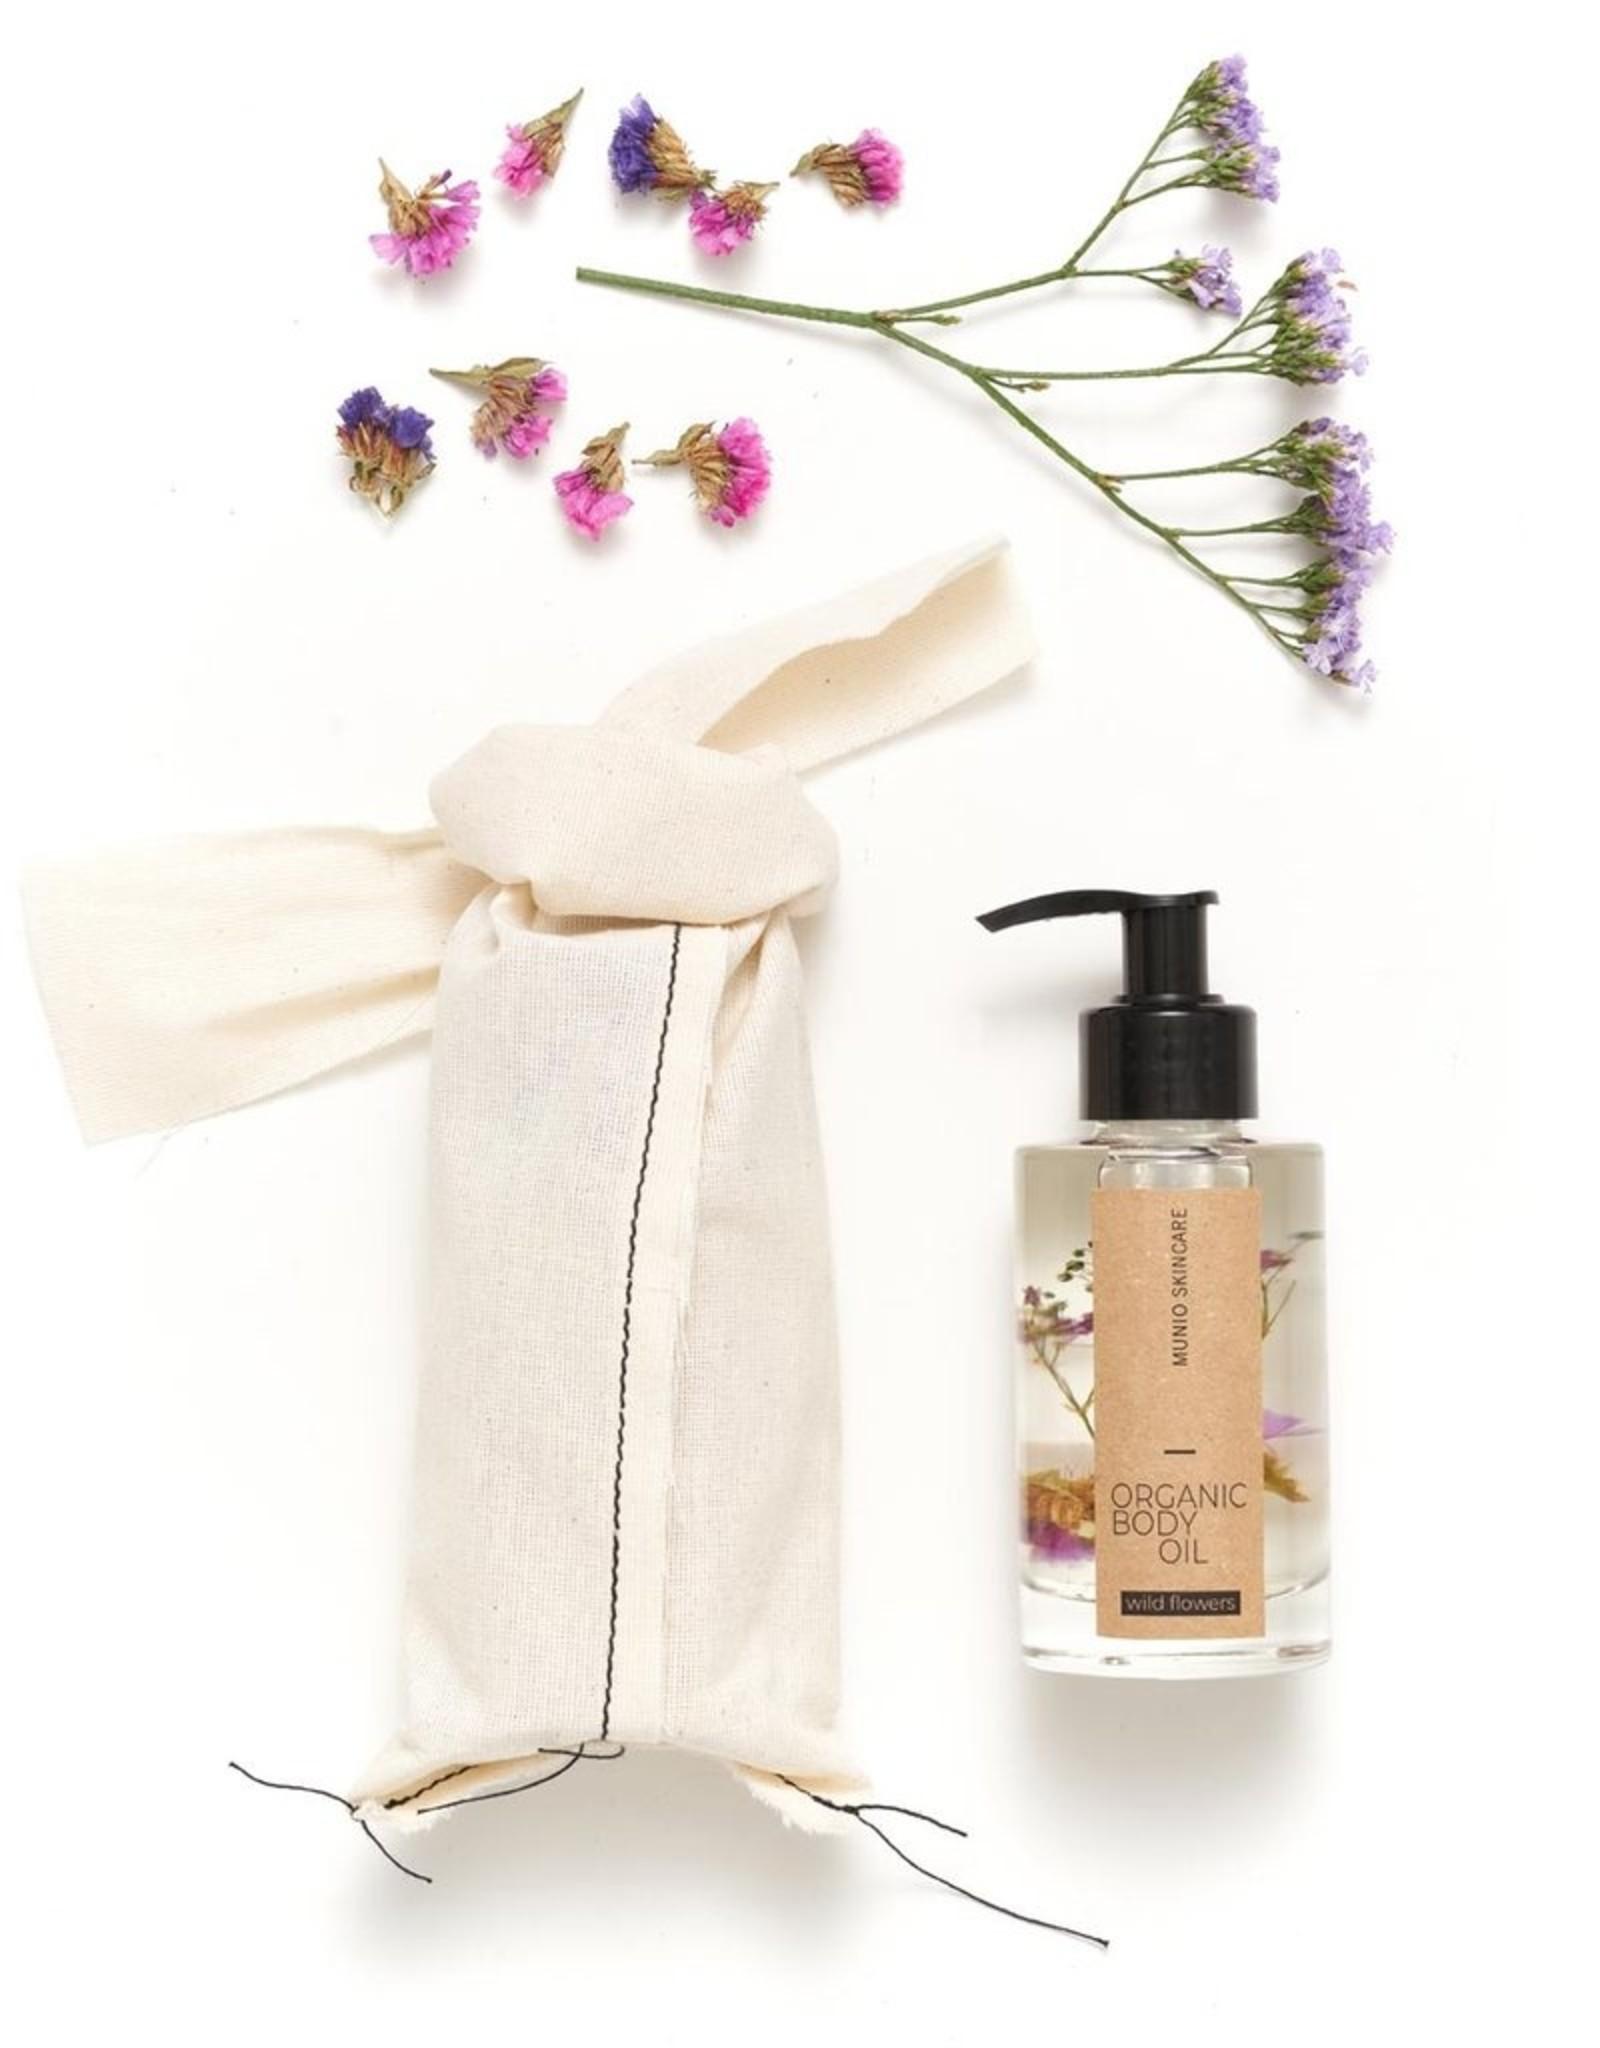 The Munio Wild flowers organic body oil